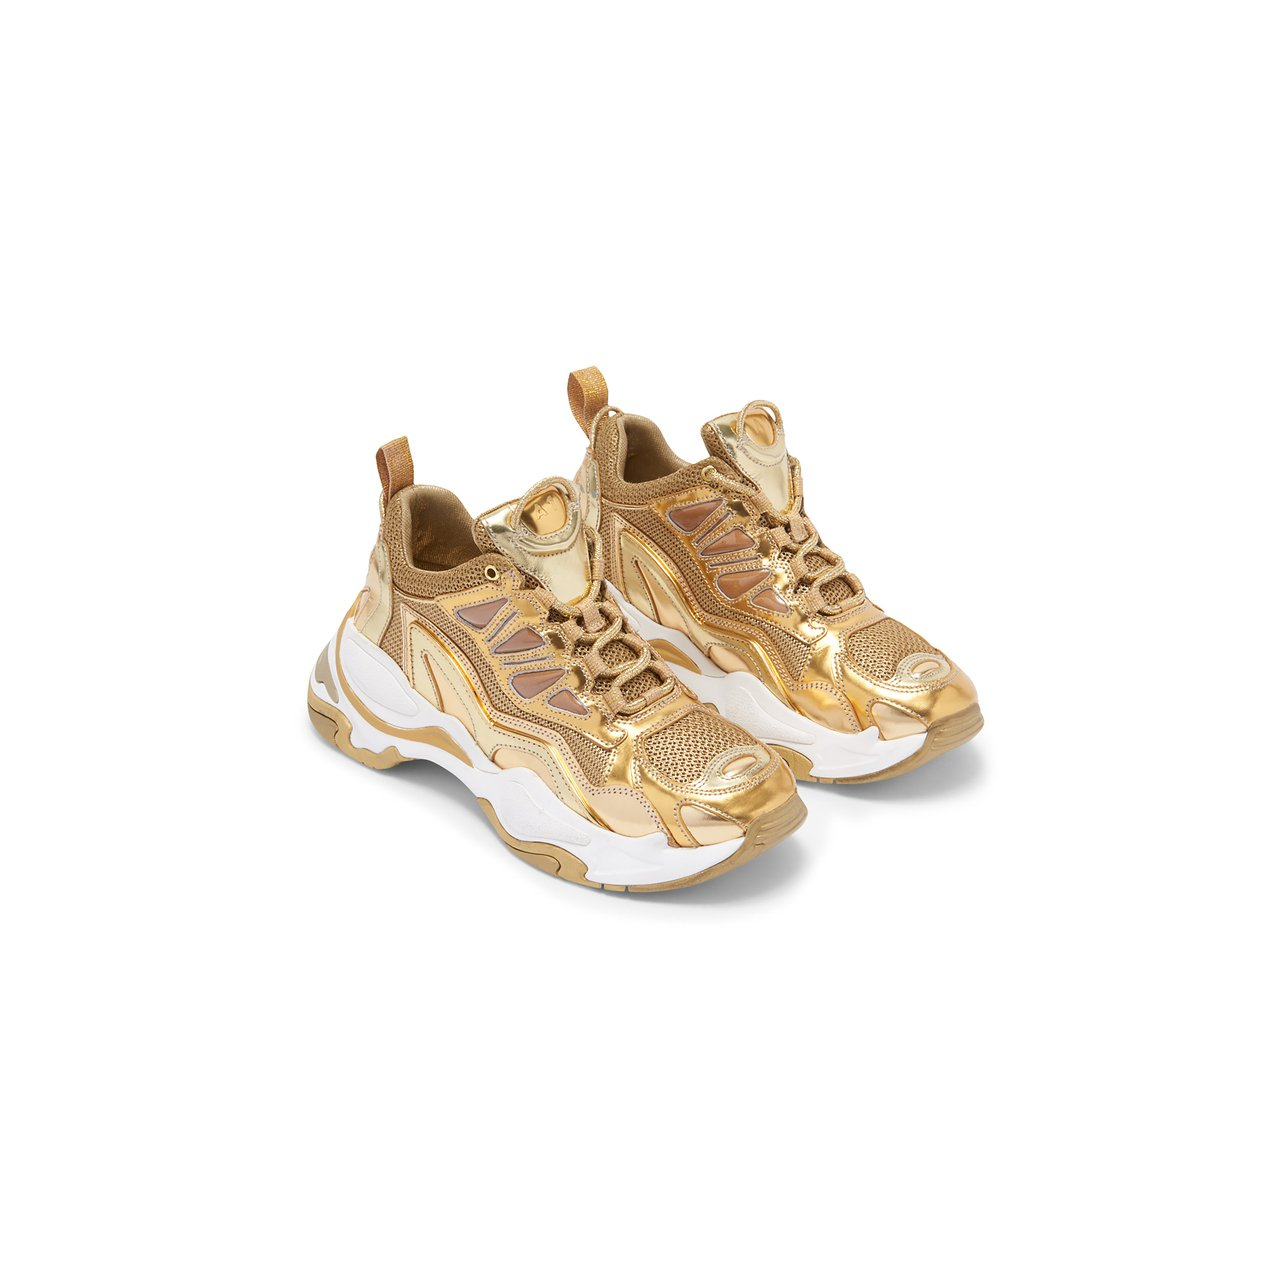 sandro Astro金色老爹鞋,售價13,680元。圖/sandro提供